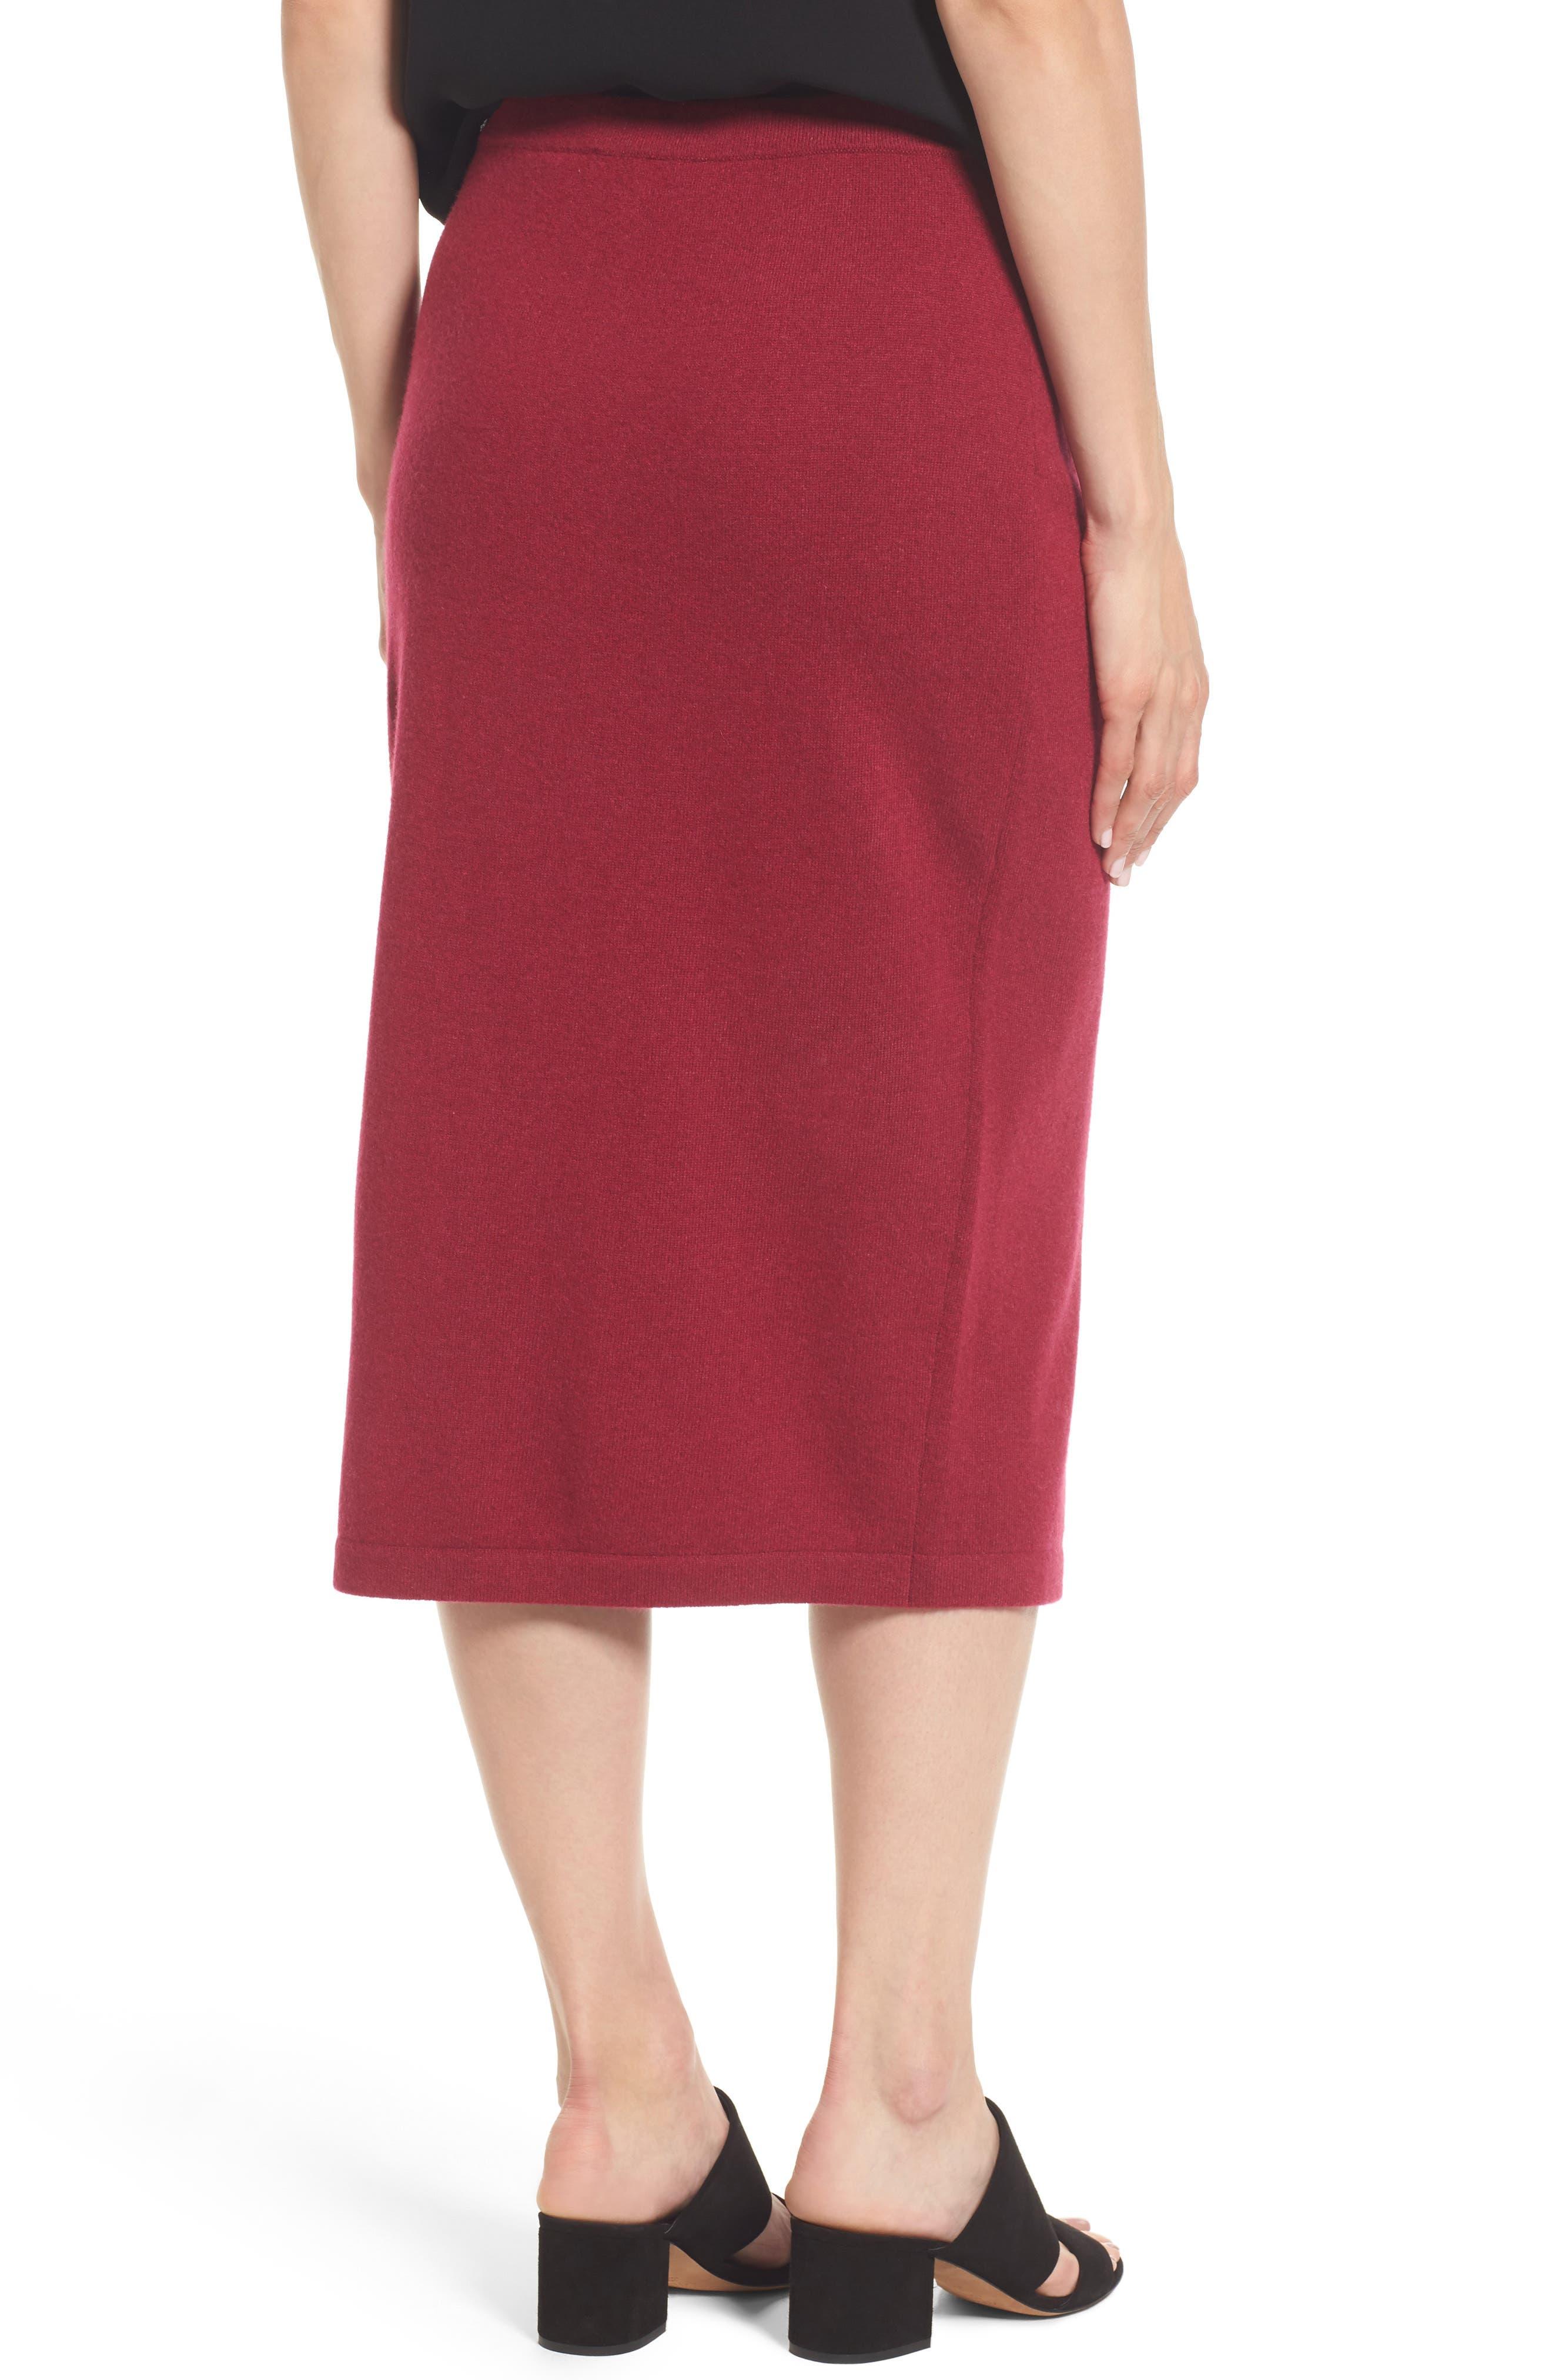 Cashmere Knit Pencil Skirt,                             Alternate thumbnail 2, color,                             Hibiscus